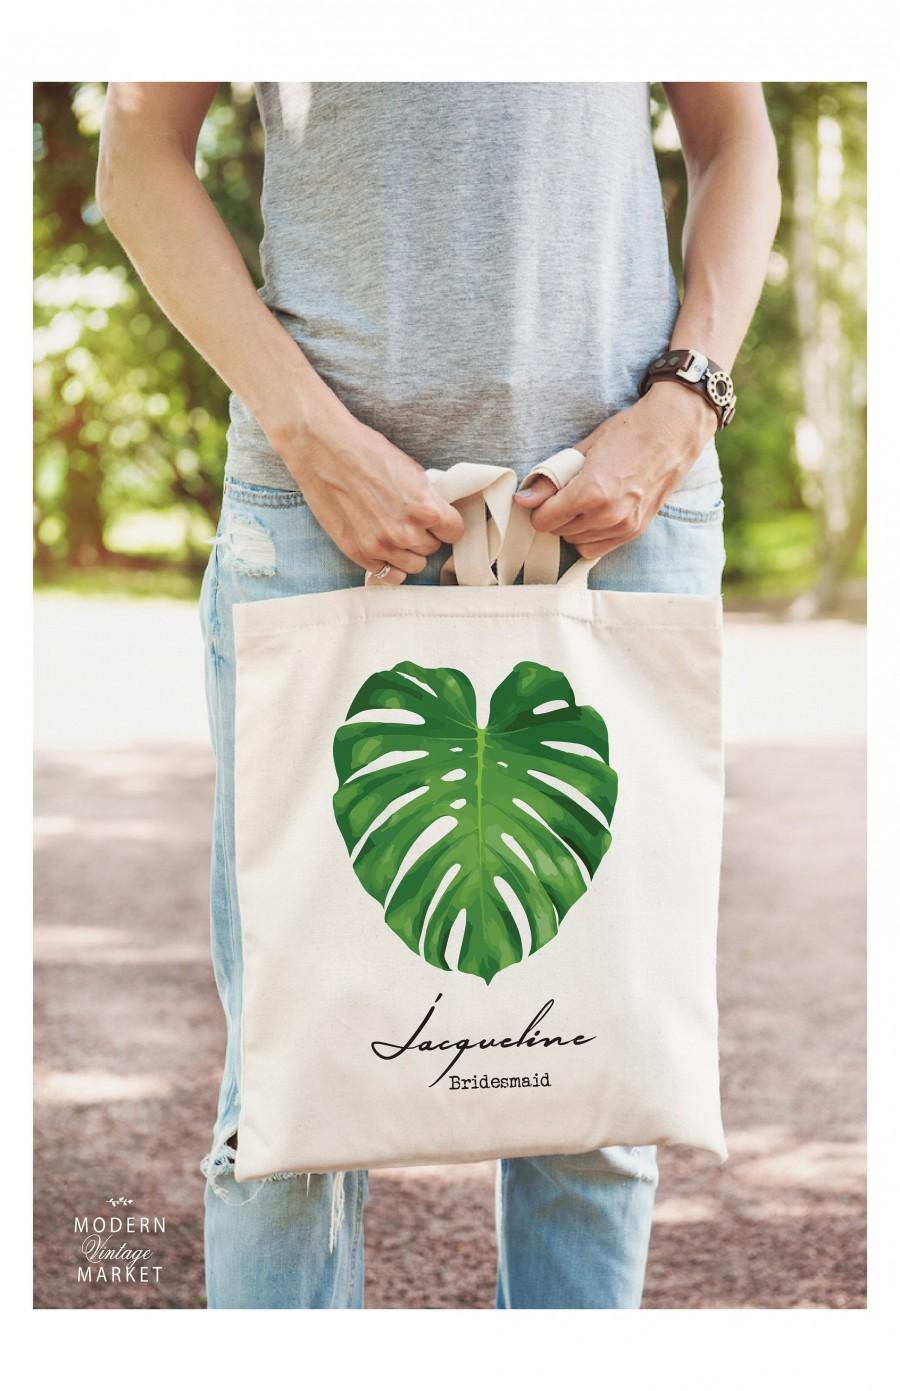 Wedding - Personalized Tote Bag With Palm Leaf,Bridesmaid Gifts,Bridesmaid Tote,Beach Bag,Bridal Party Gifts,Wedding Party Gifts,Personalized Tote Bag